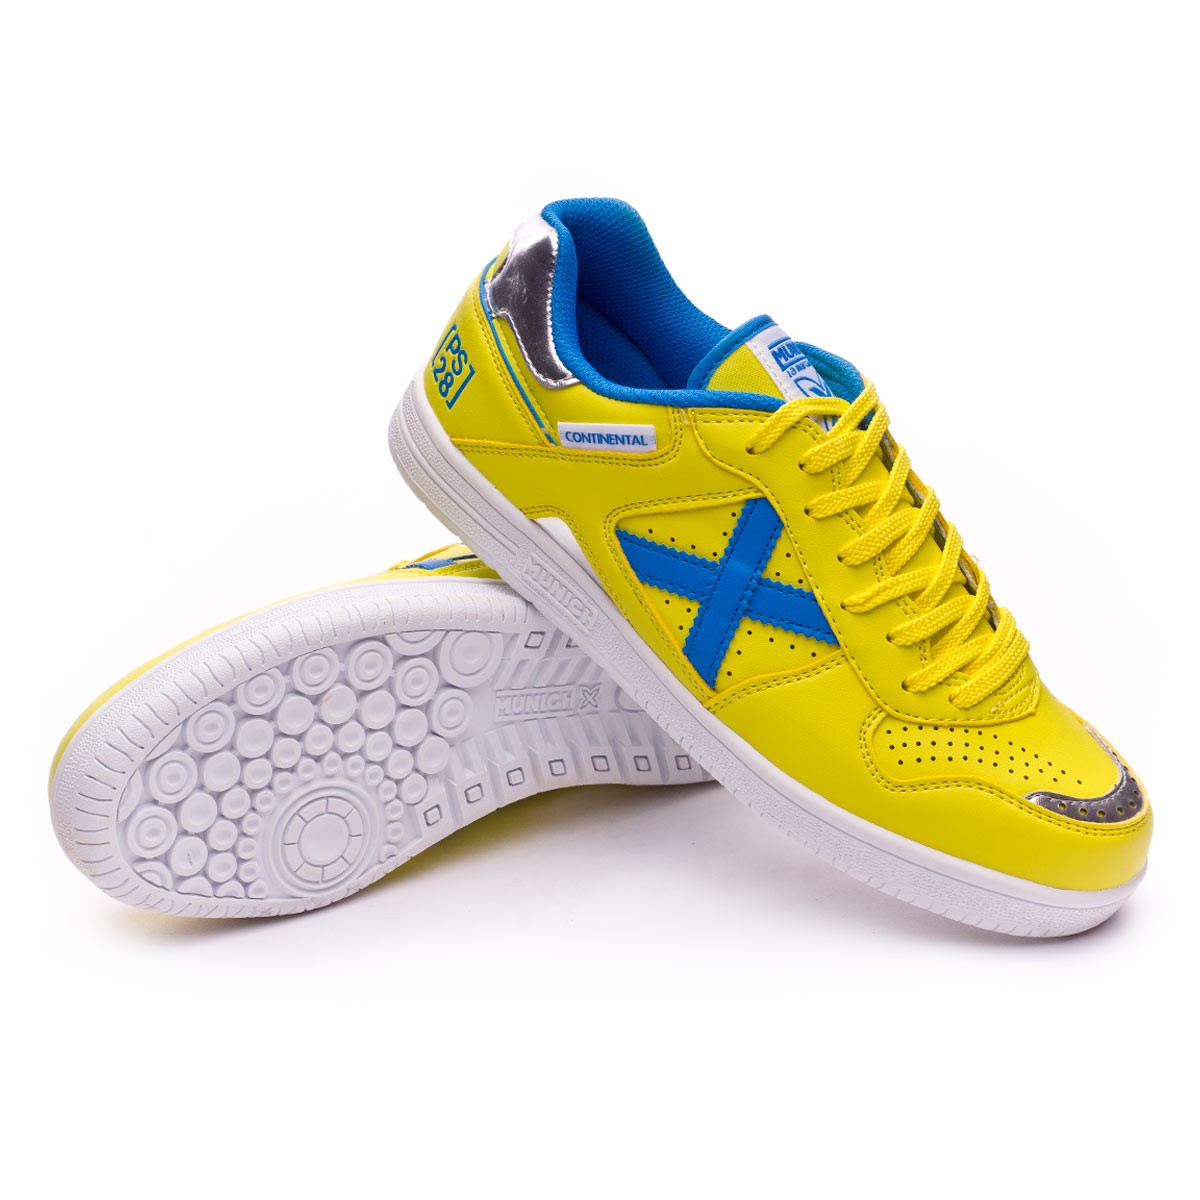 3ed52d4d2a1 Futsal Boot Munich Continental V2 Paco Sedano Yellow-Blue - Football ...